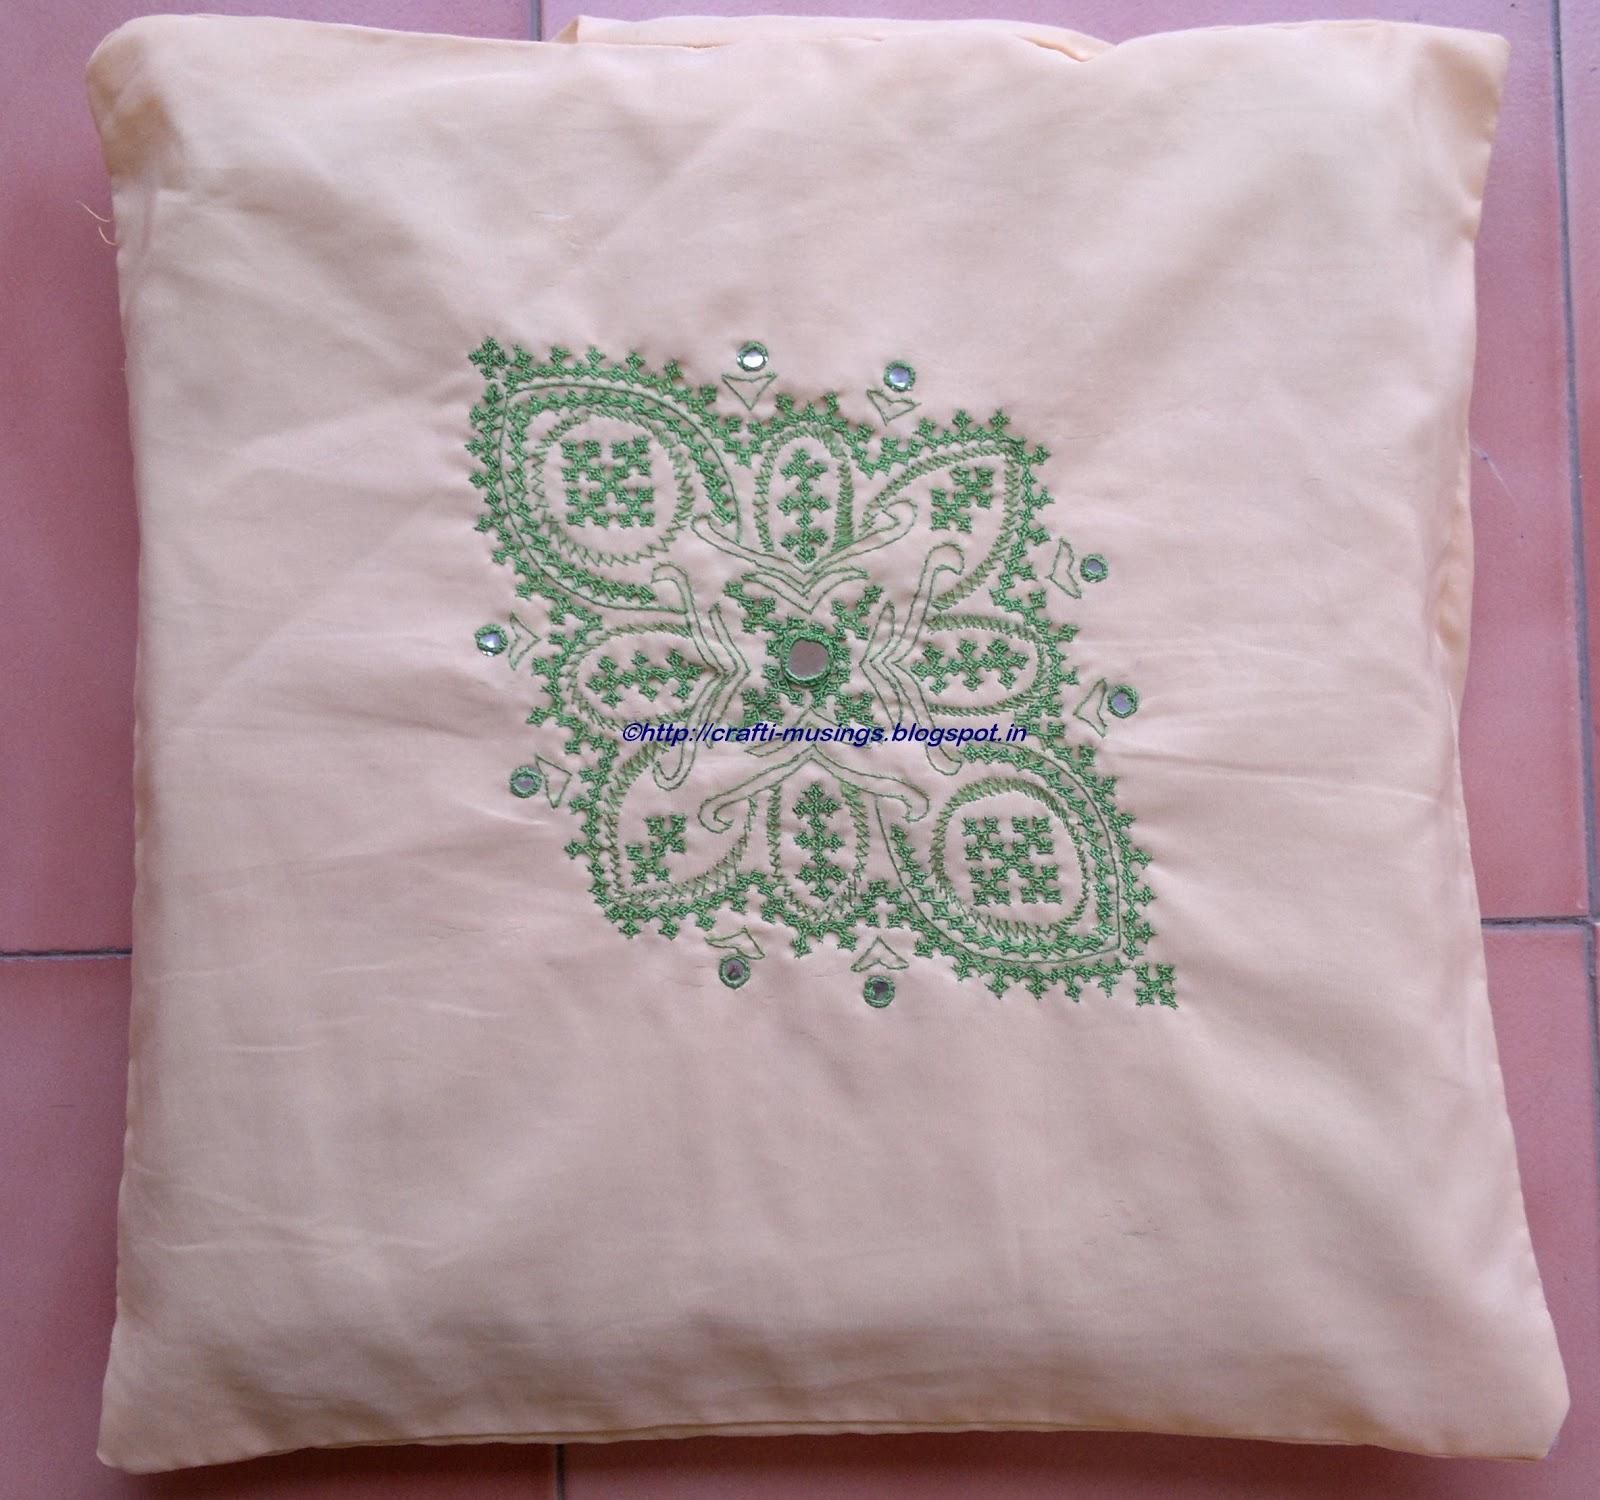 Crafti musings kutchwork cushions